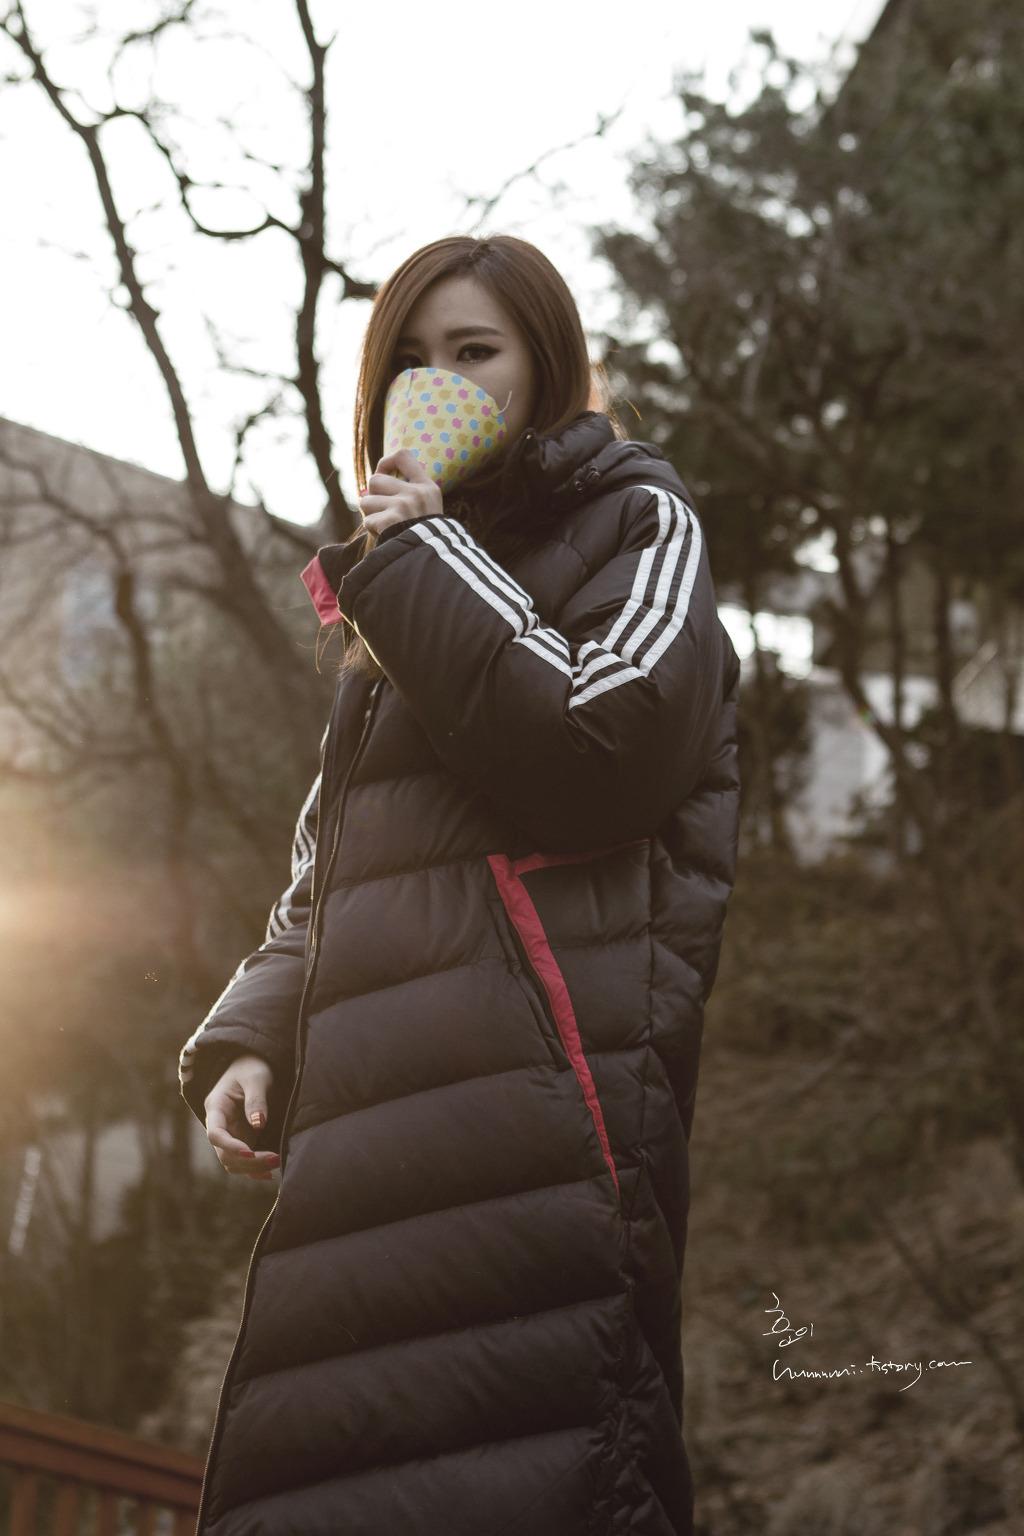 [HQ/FANTAKEN] 14.12.07 EXID's Fans Meeting after Inkigayo byhunnnnni